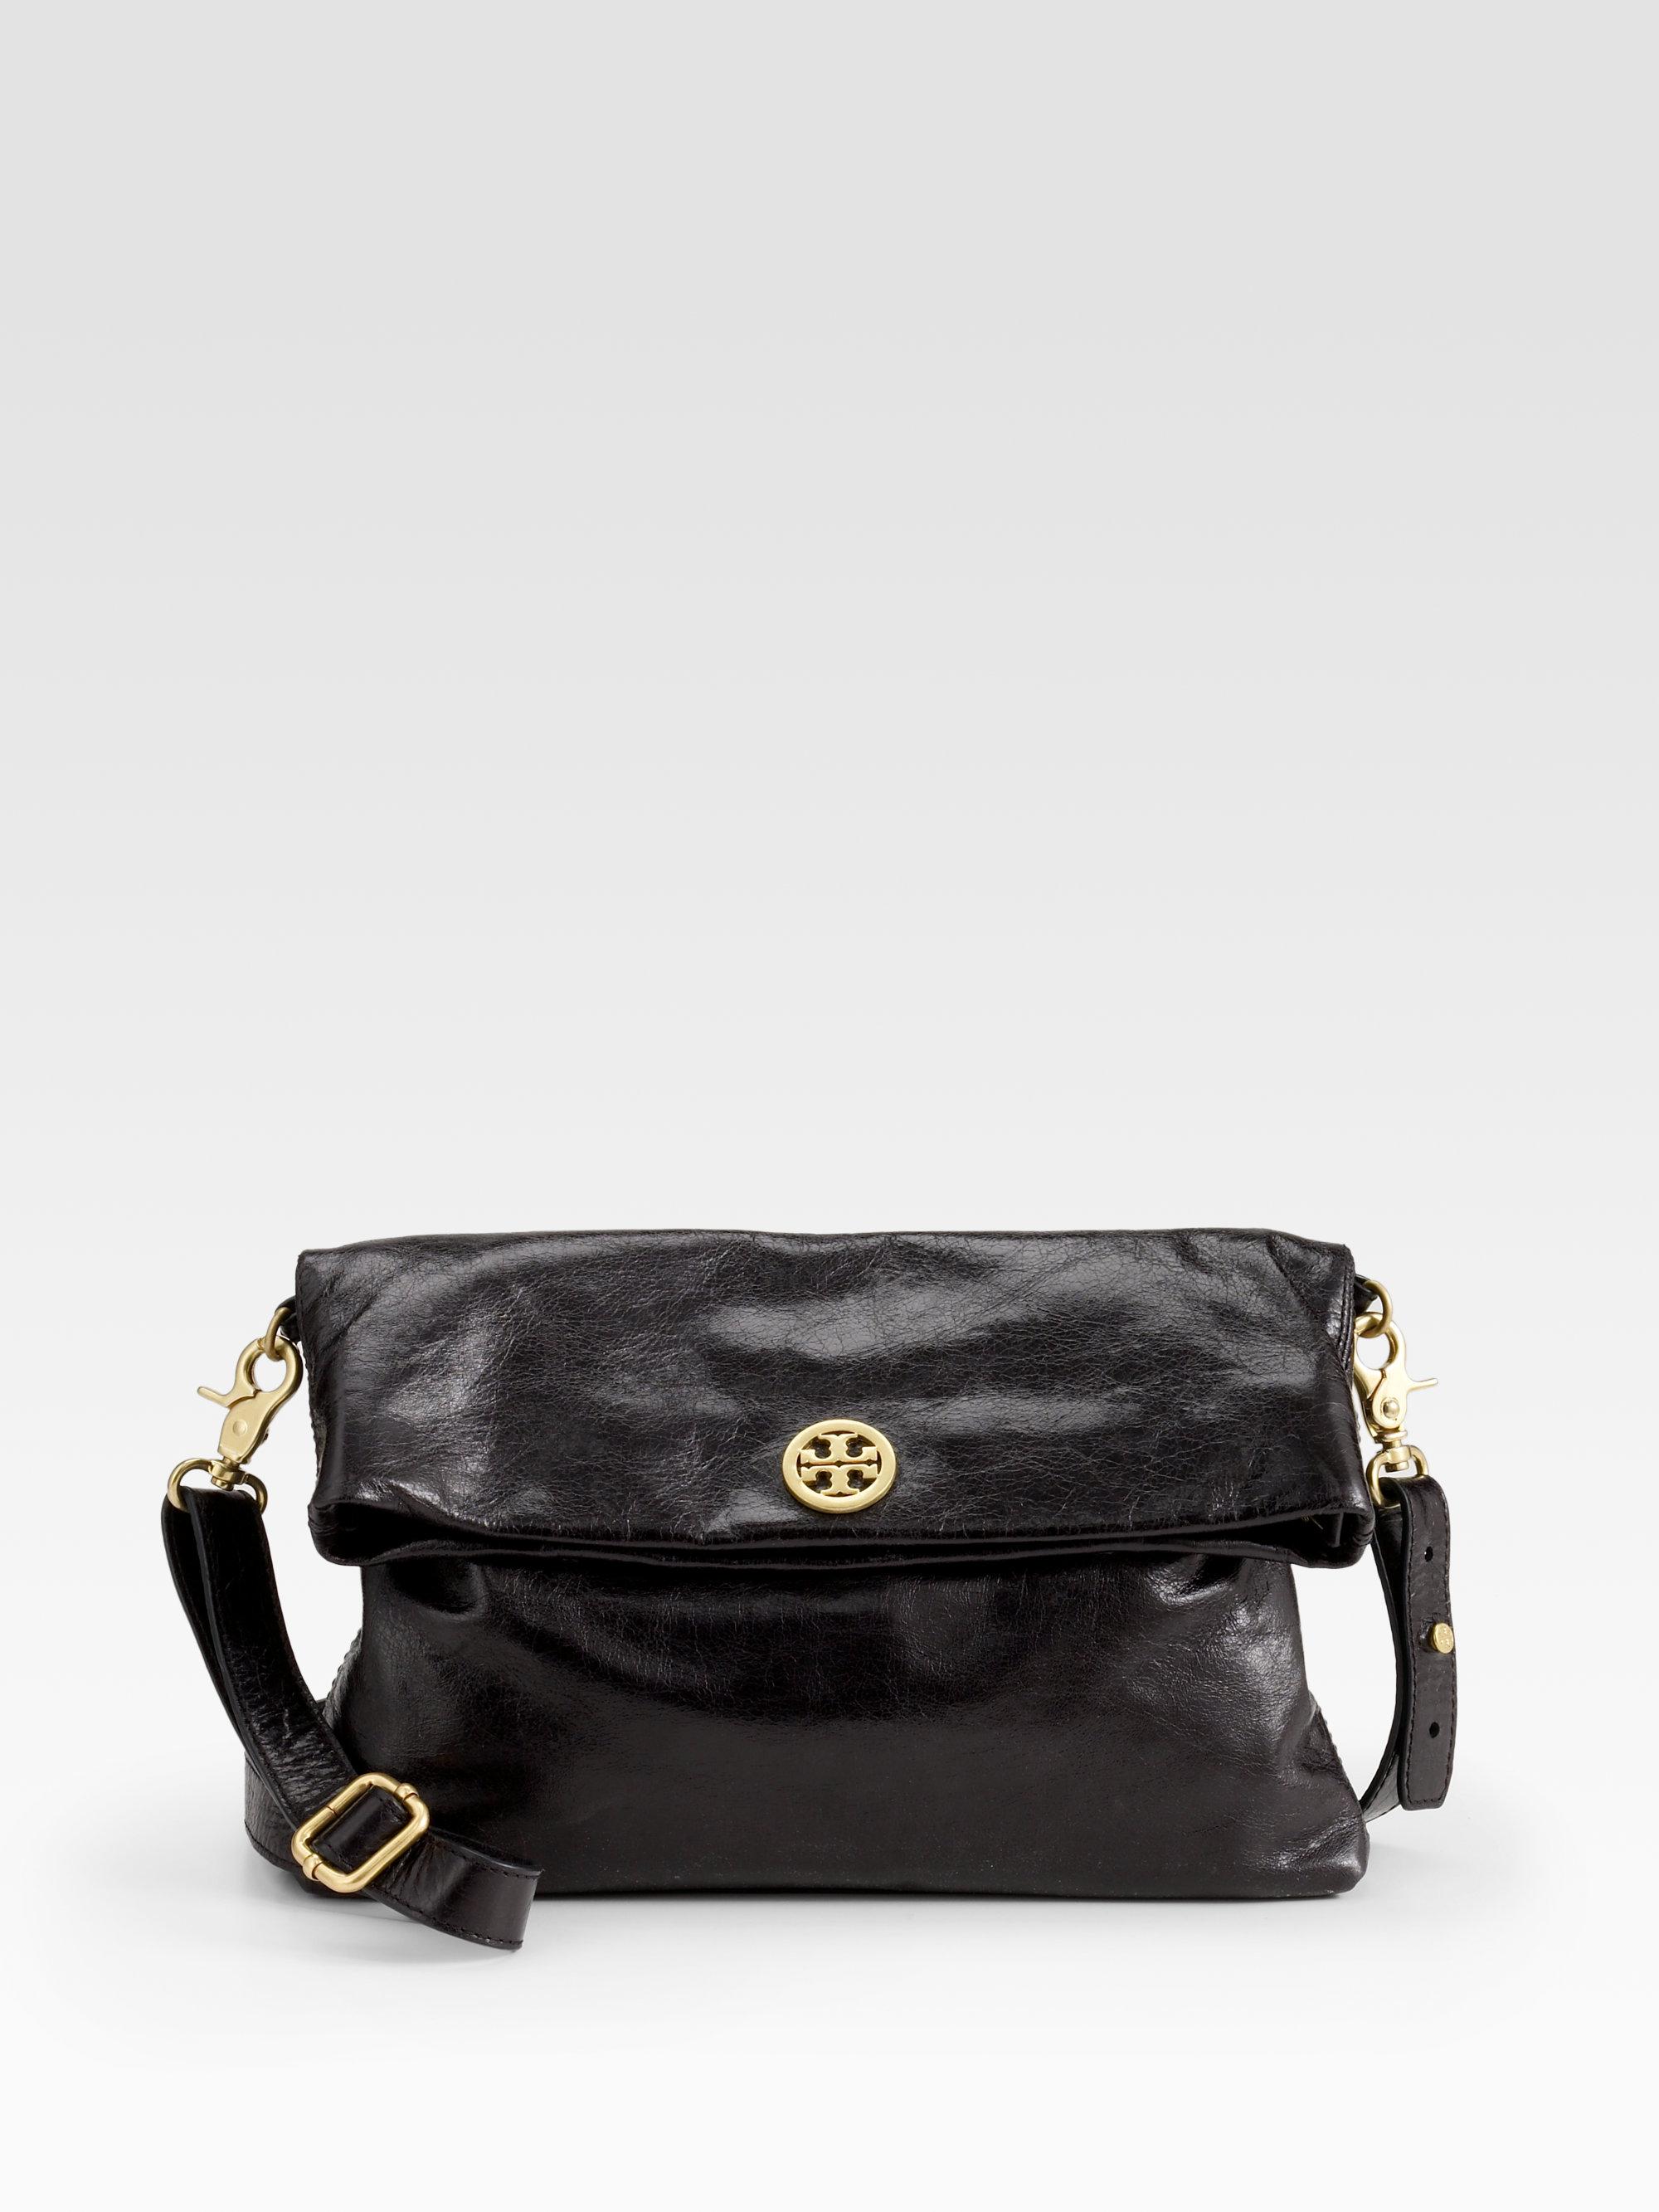 f12f5fbcd171 Lyst - Tory Burch Dena Messenger Leather Bag in Black